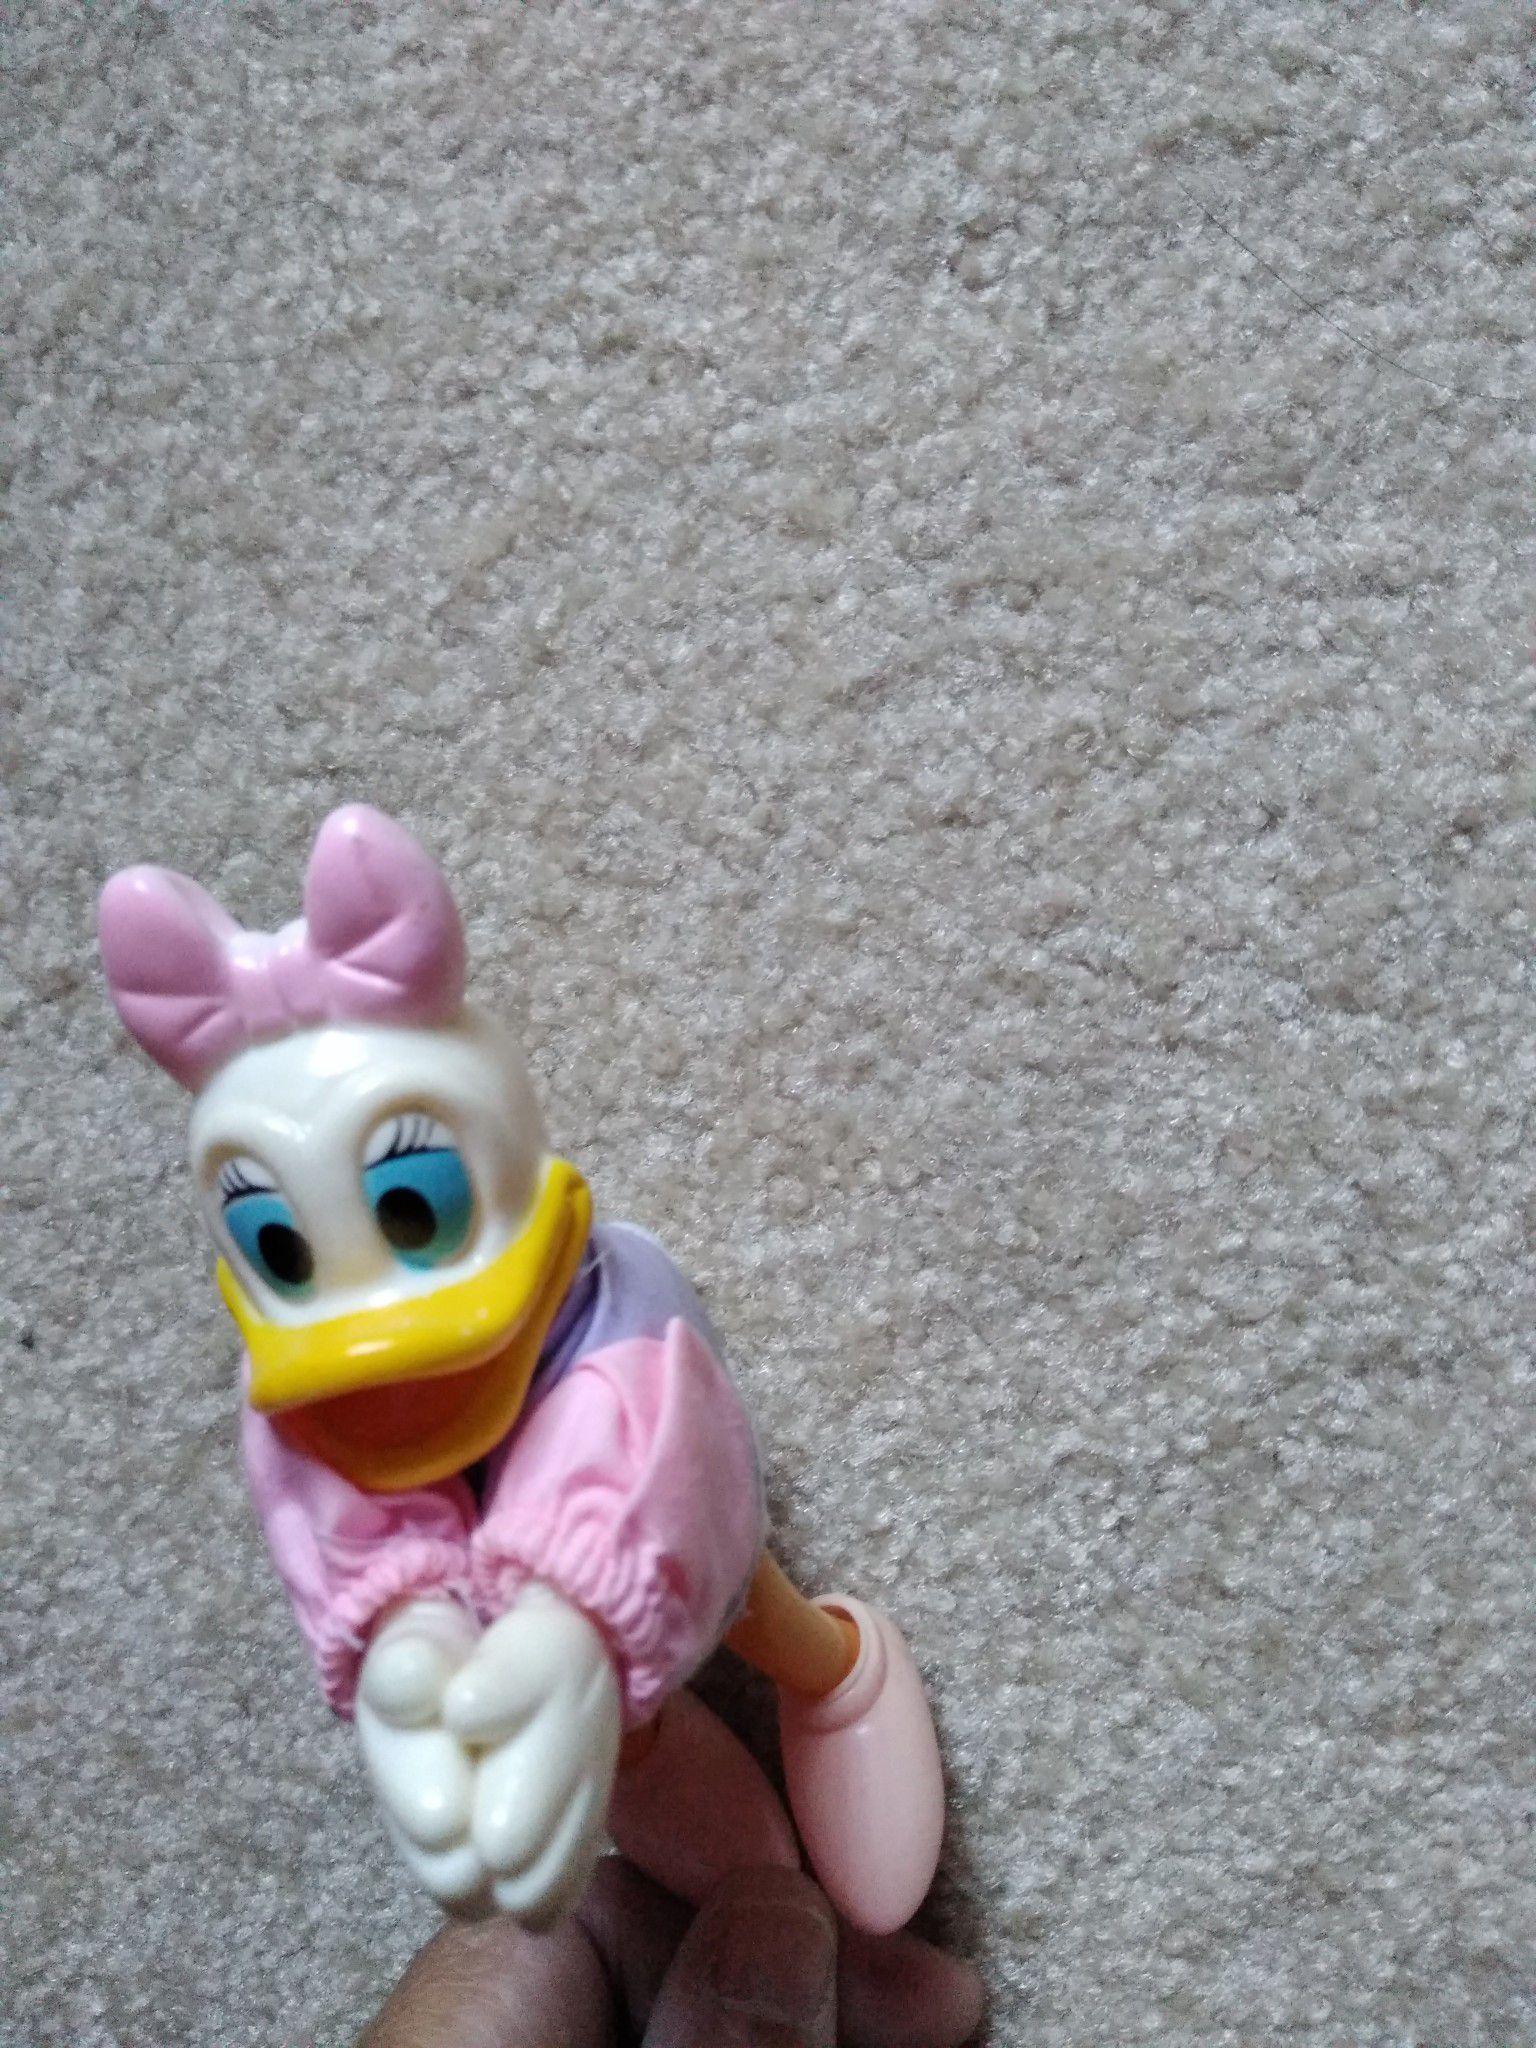 Disney clasp toys